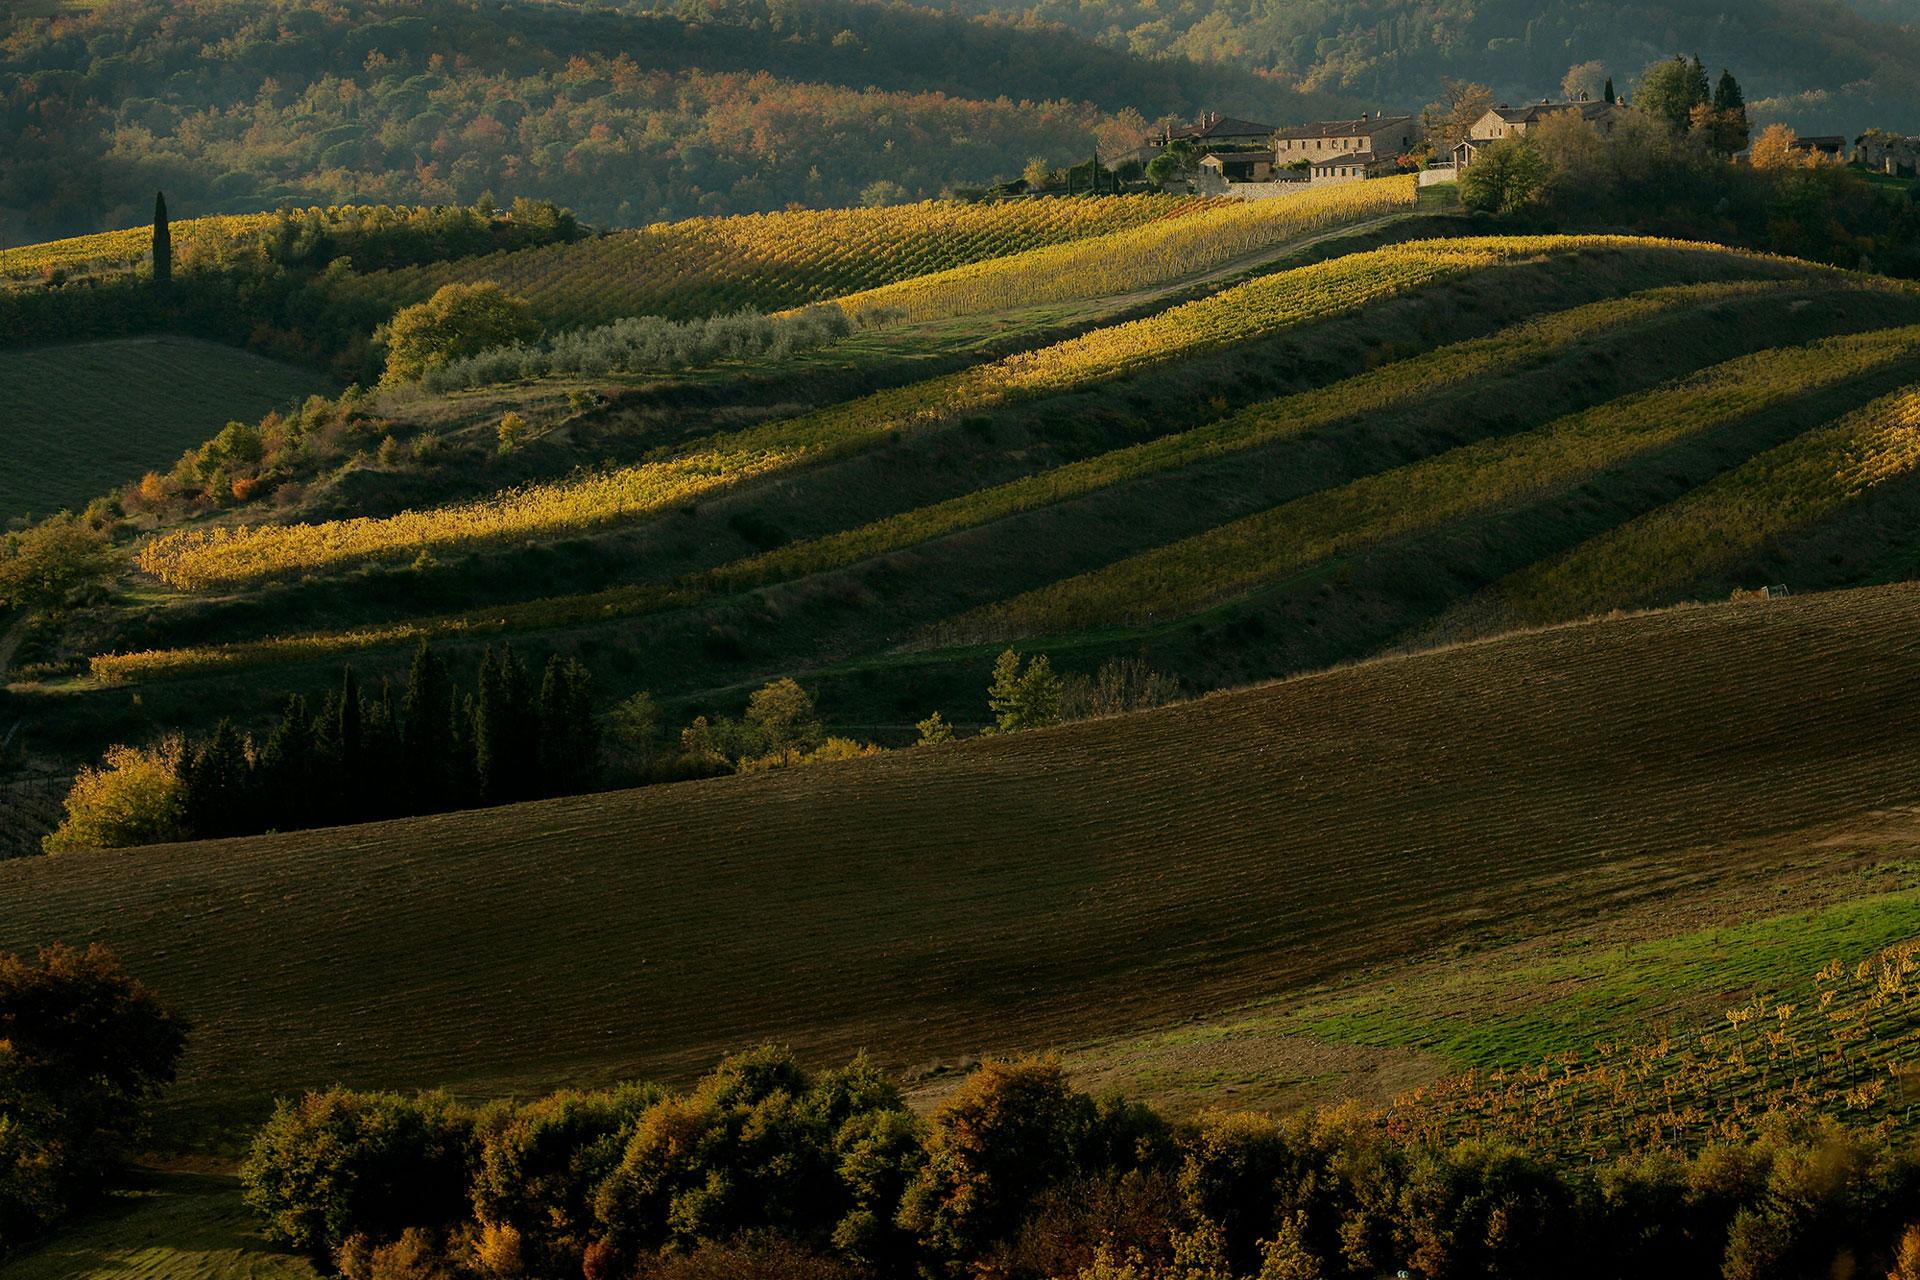 Eastern Part of Chianti Classico